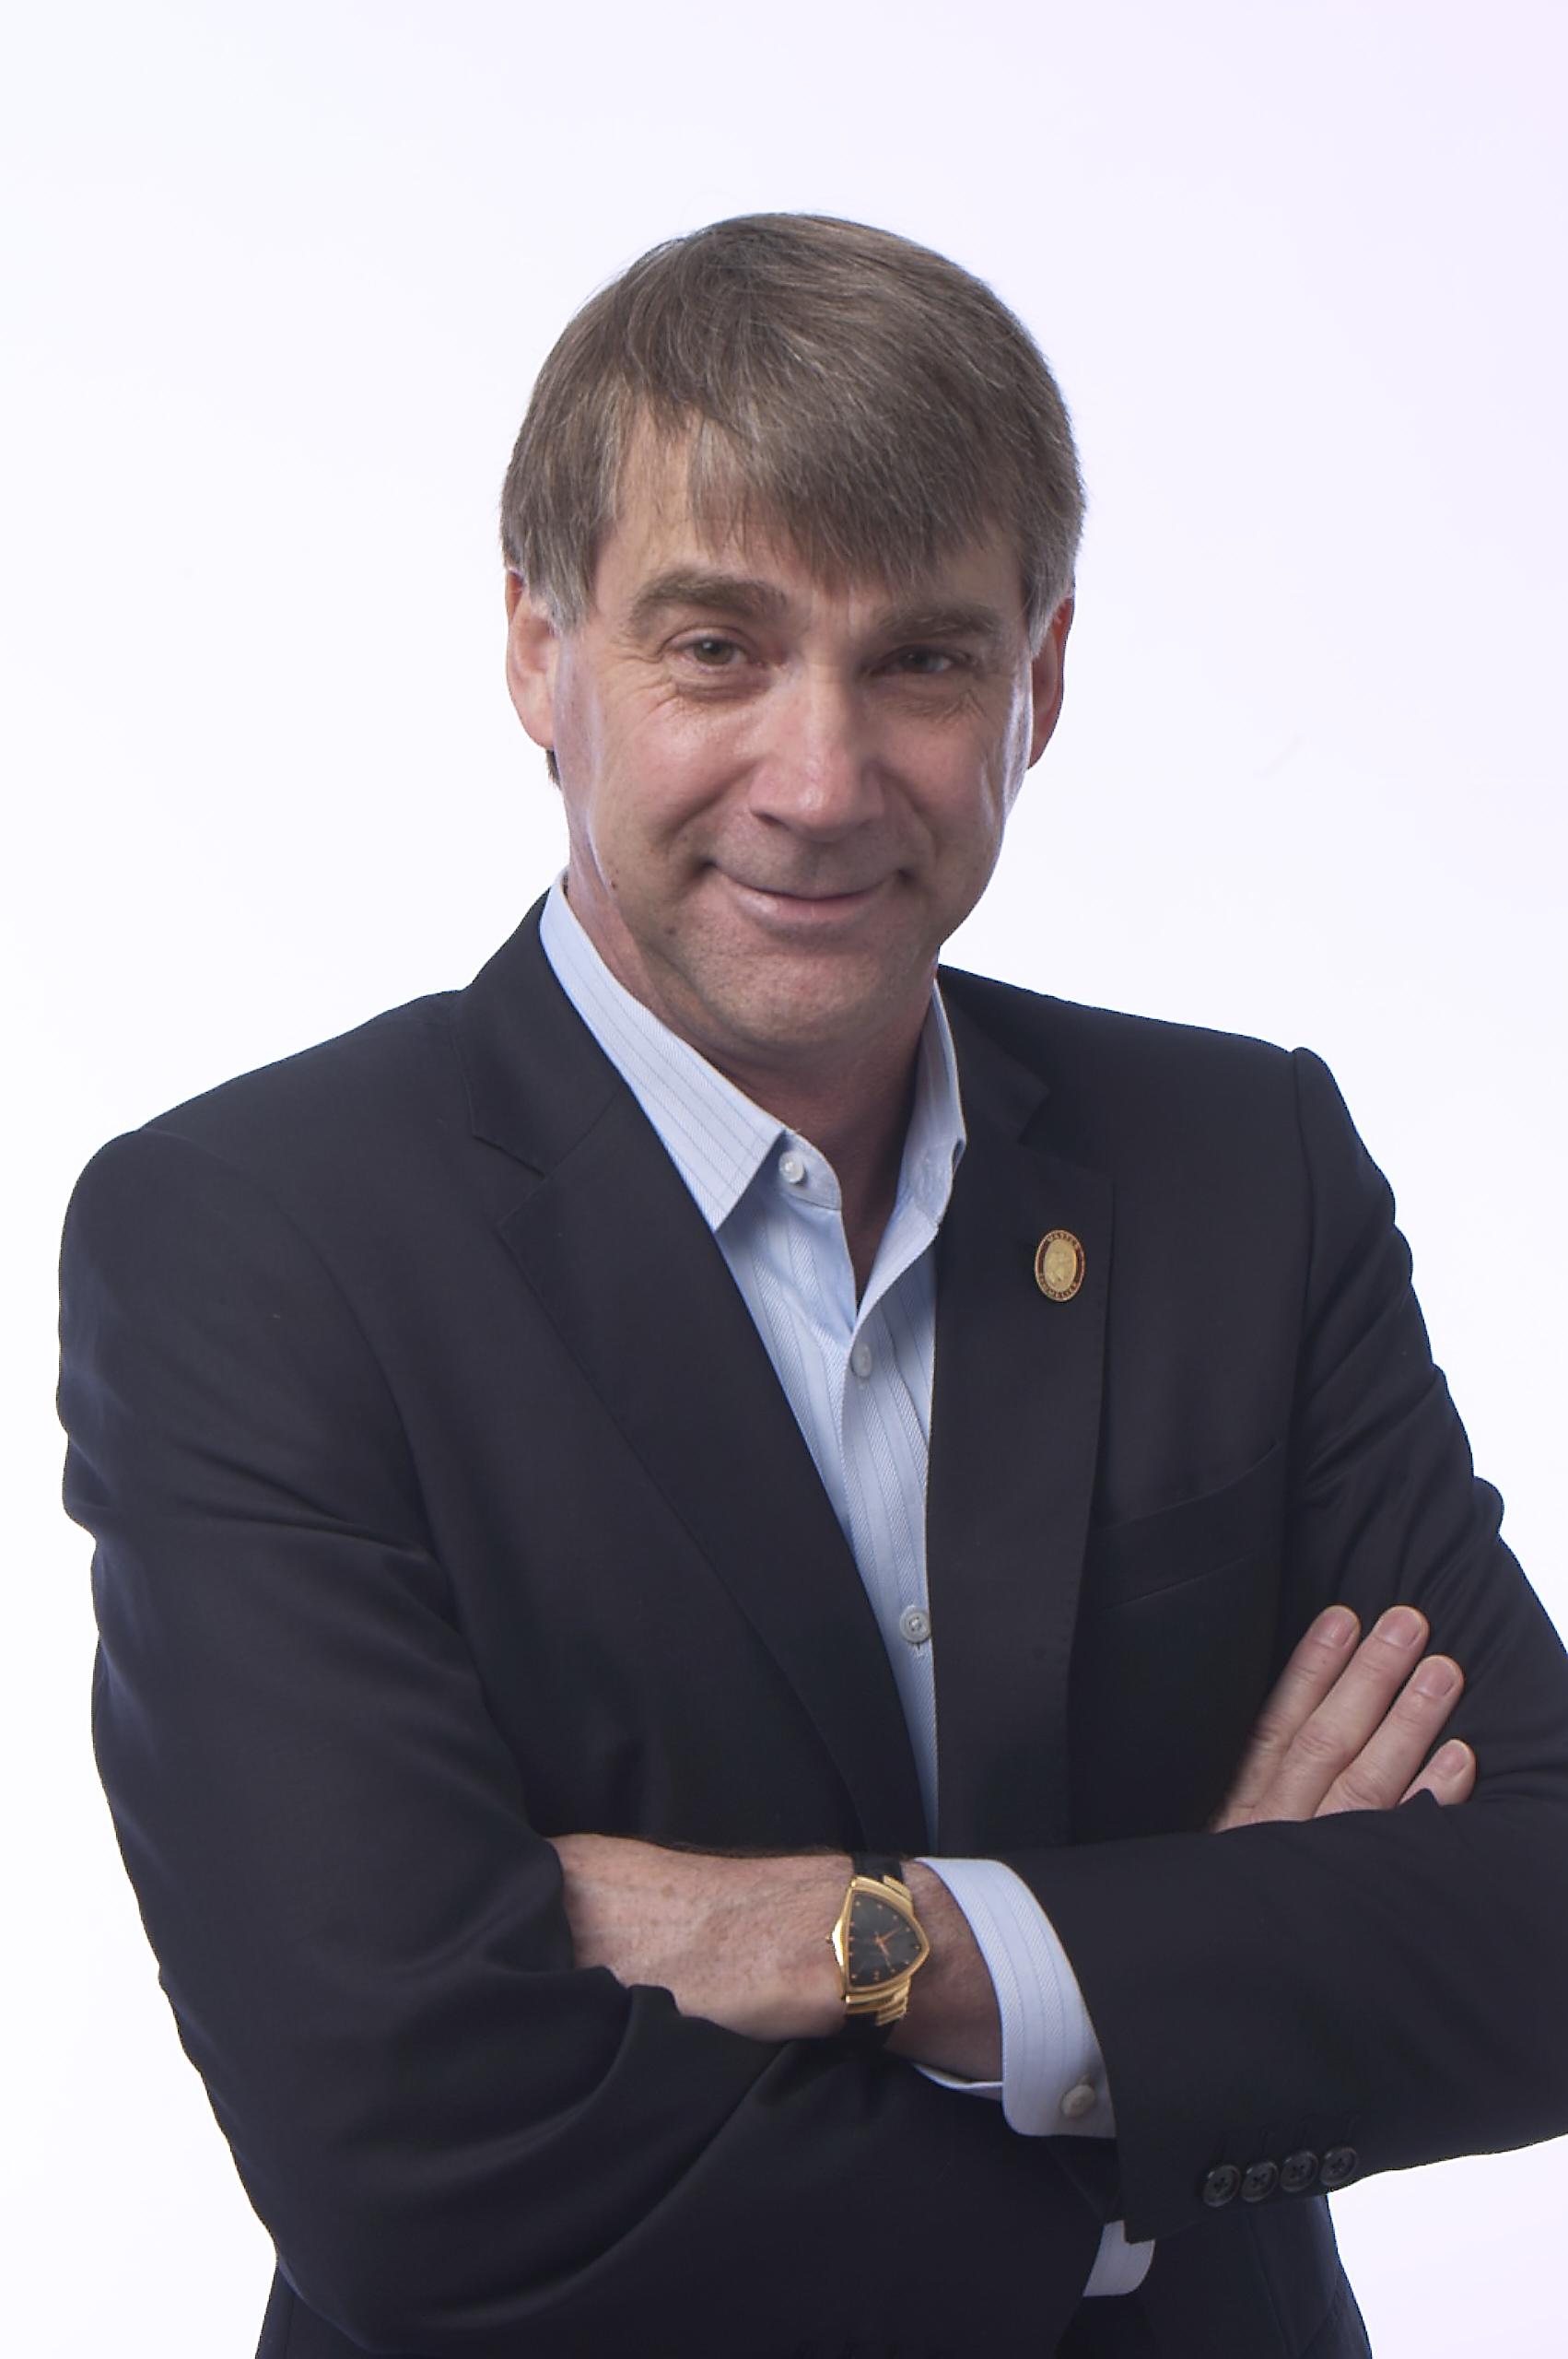 Tim Gaiser